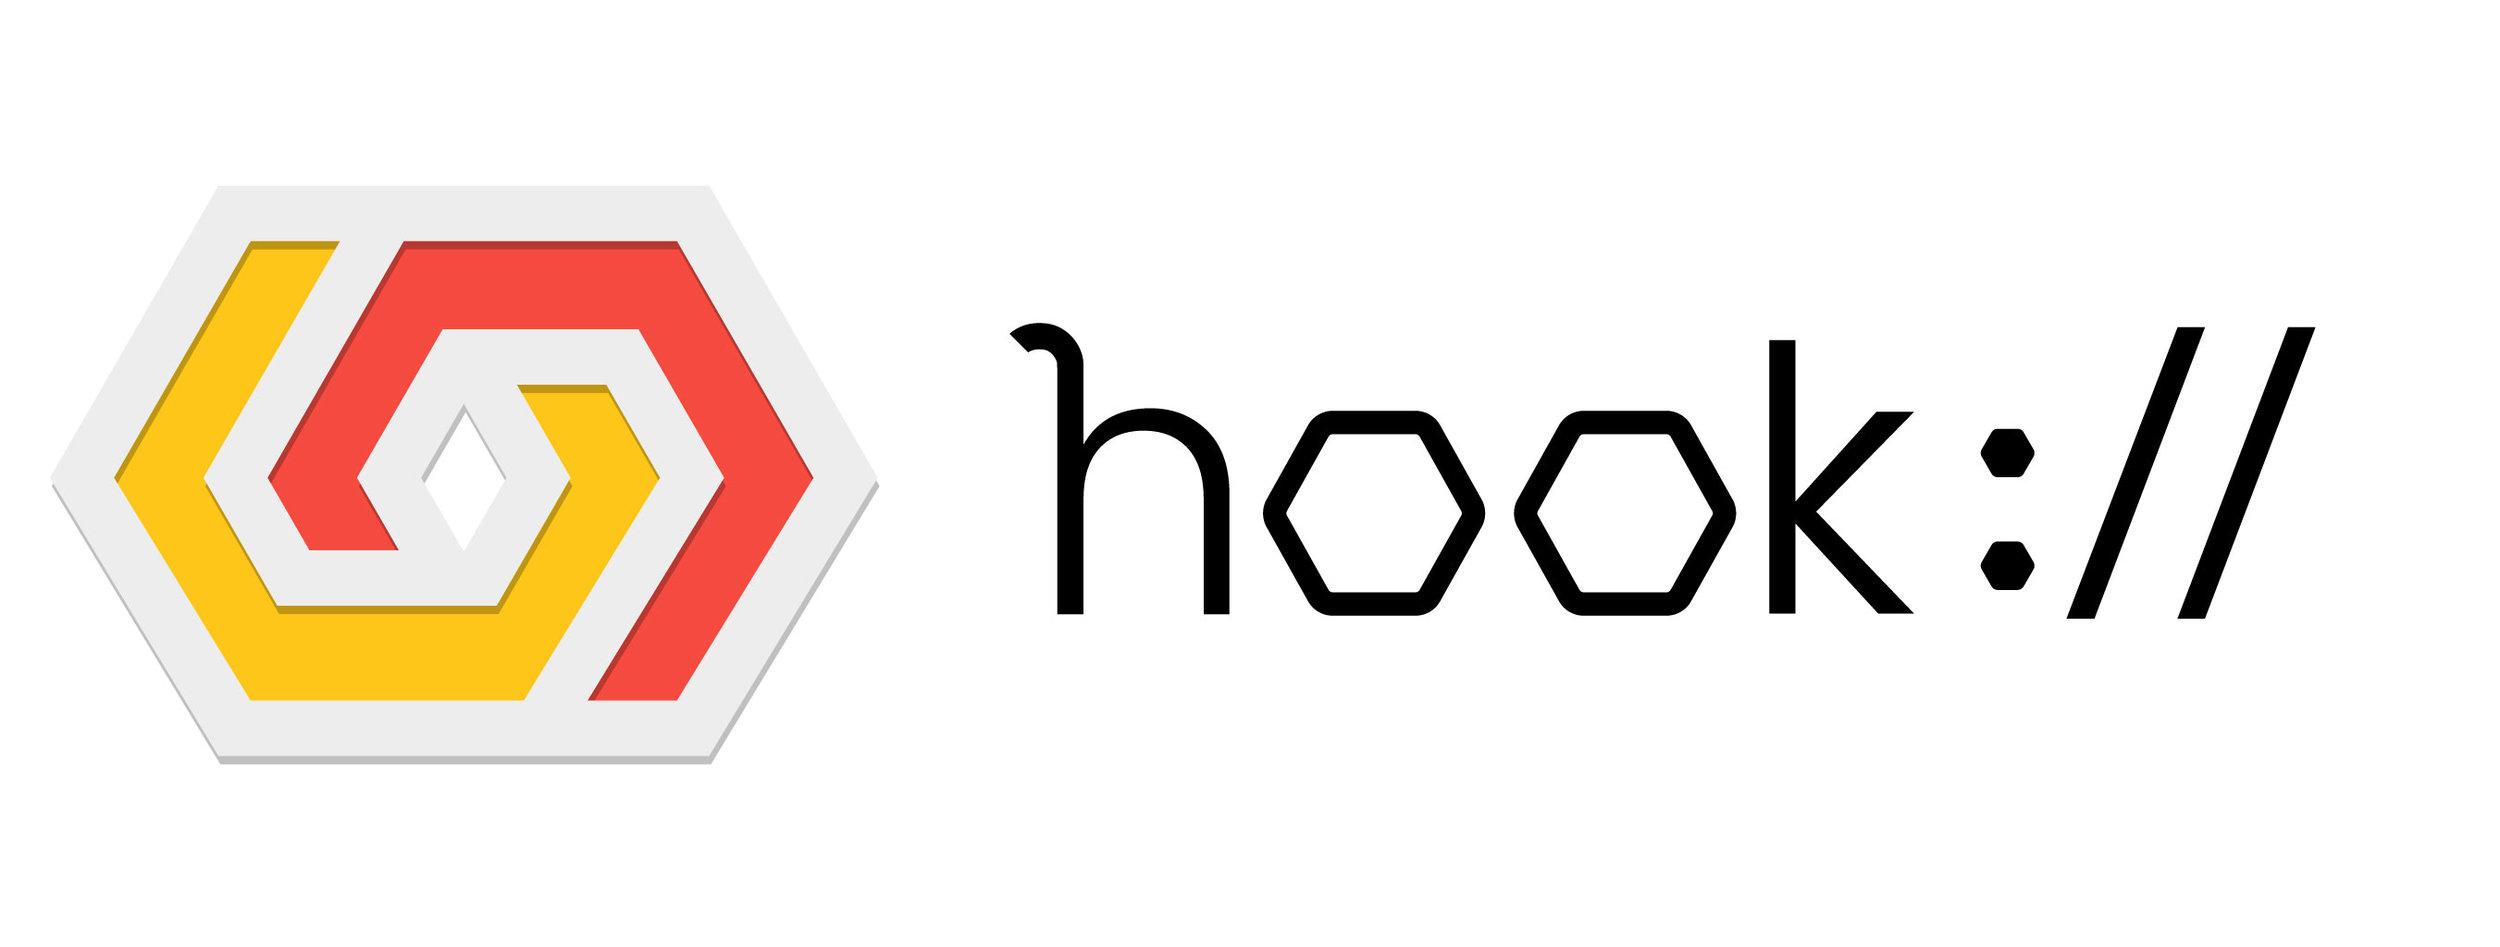 logo4-3.jpg